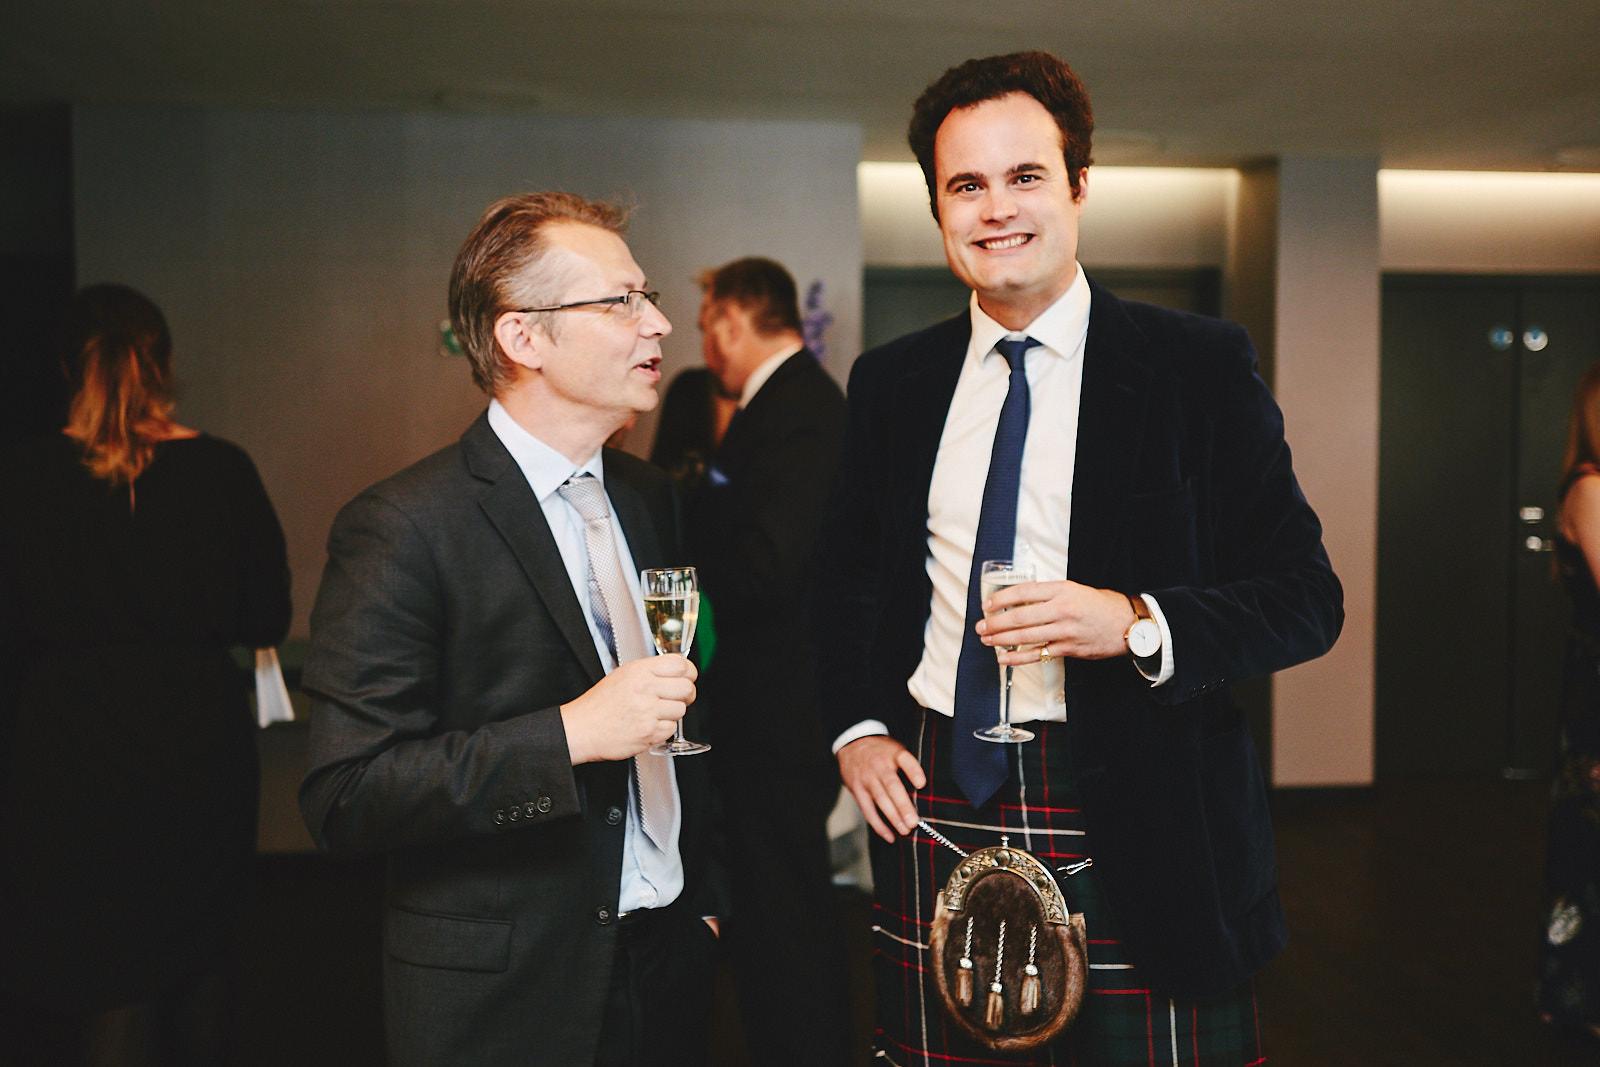 US consulate Edinburgh 4th of July celebration 2018 - 005 web.jpg